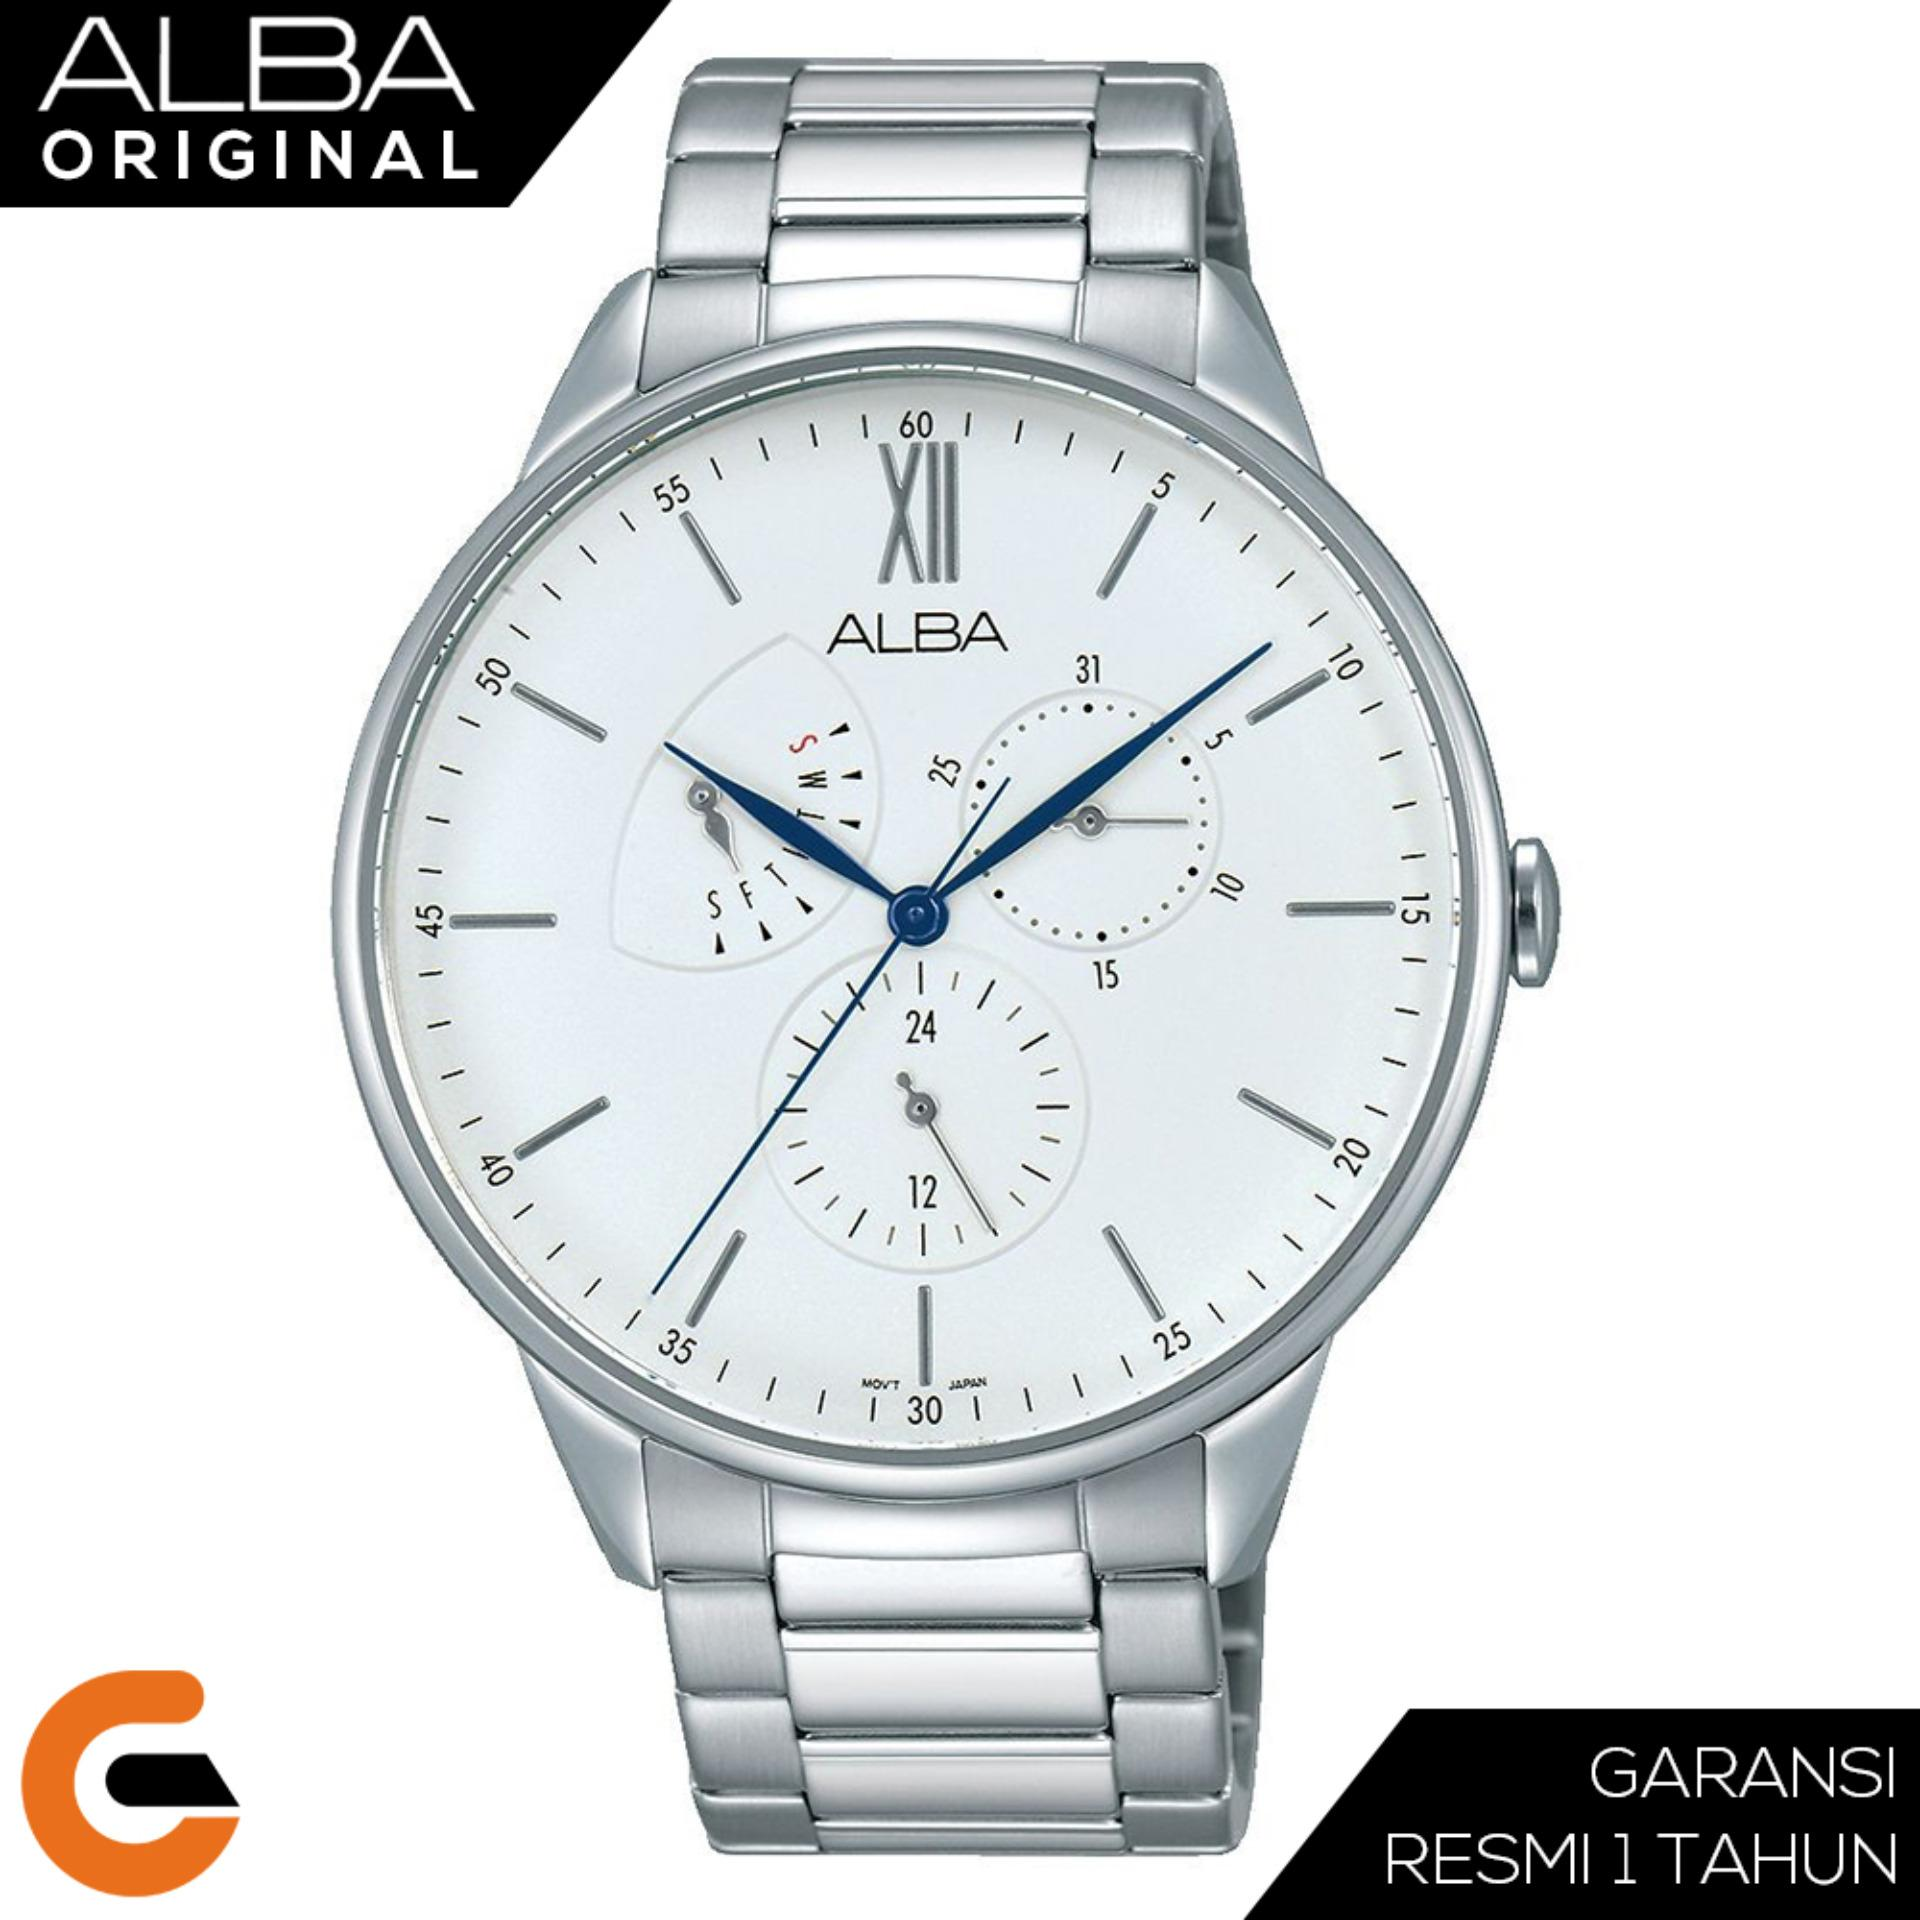 Seiko Chronograph Jam Tangan Pria Tali Stainless Steel Ssb175p1 Strap Silver Sks521p1 Alba Quartz Movement Az800 Series